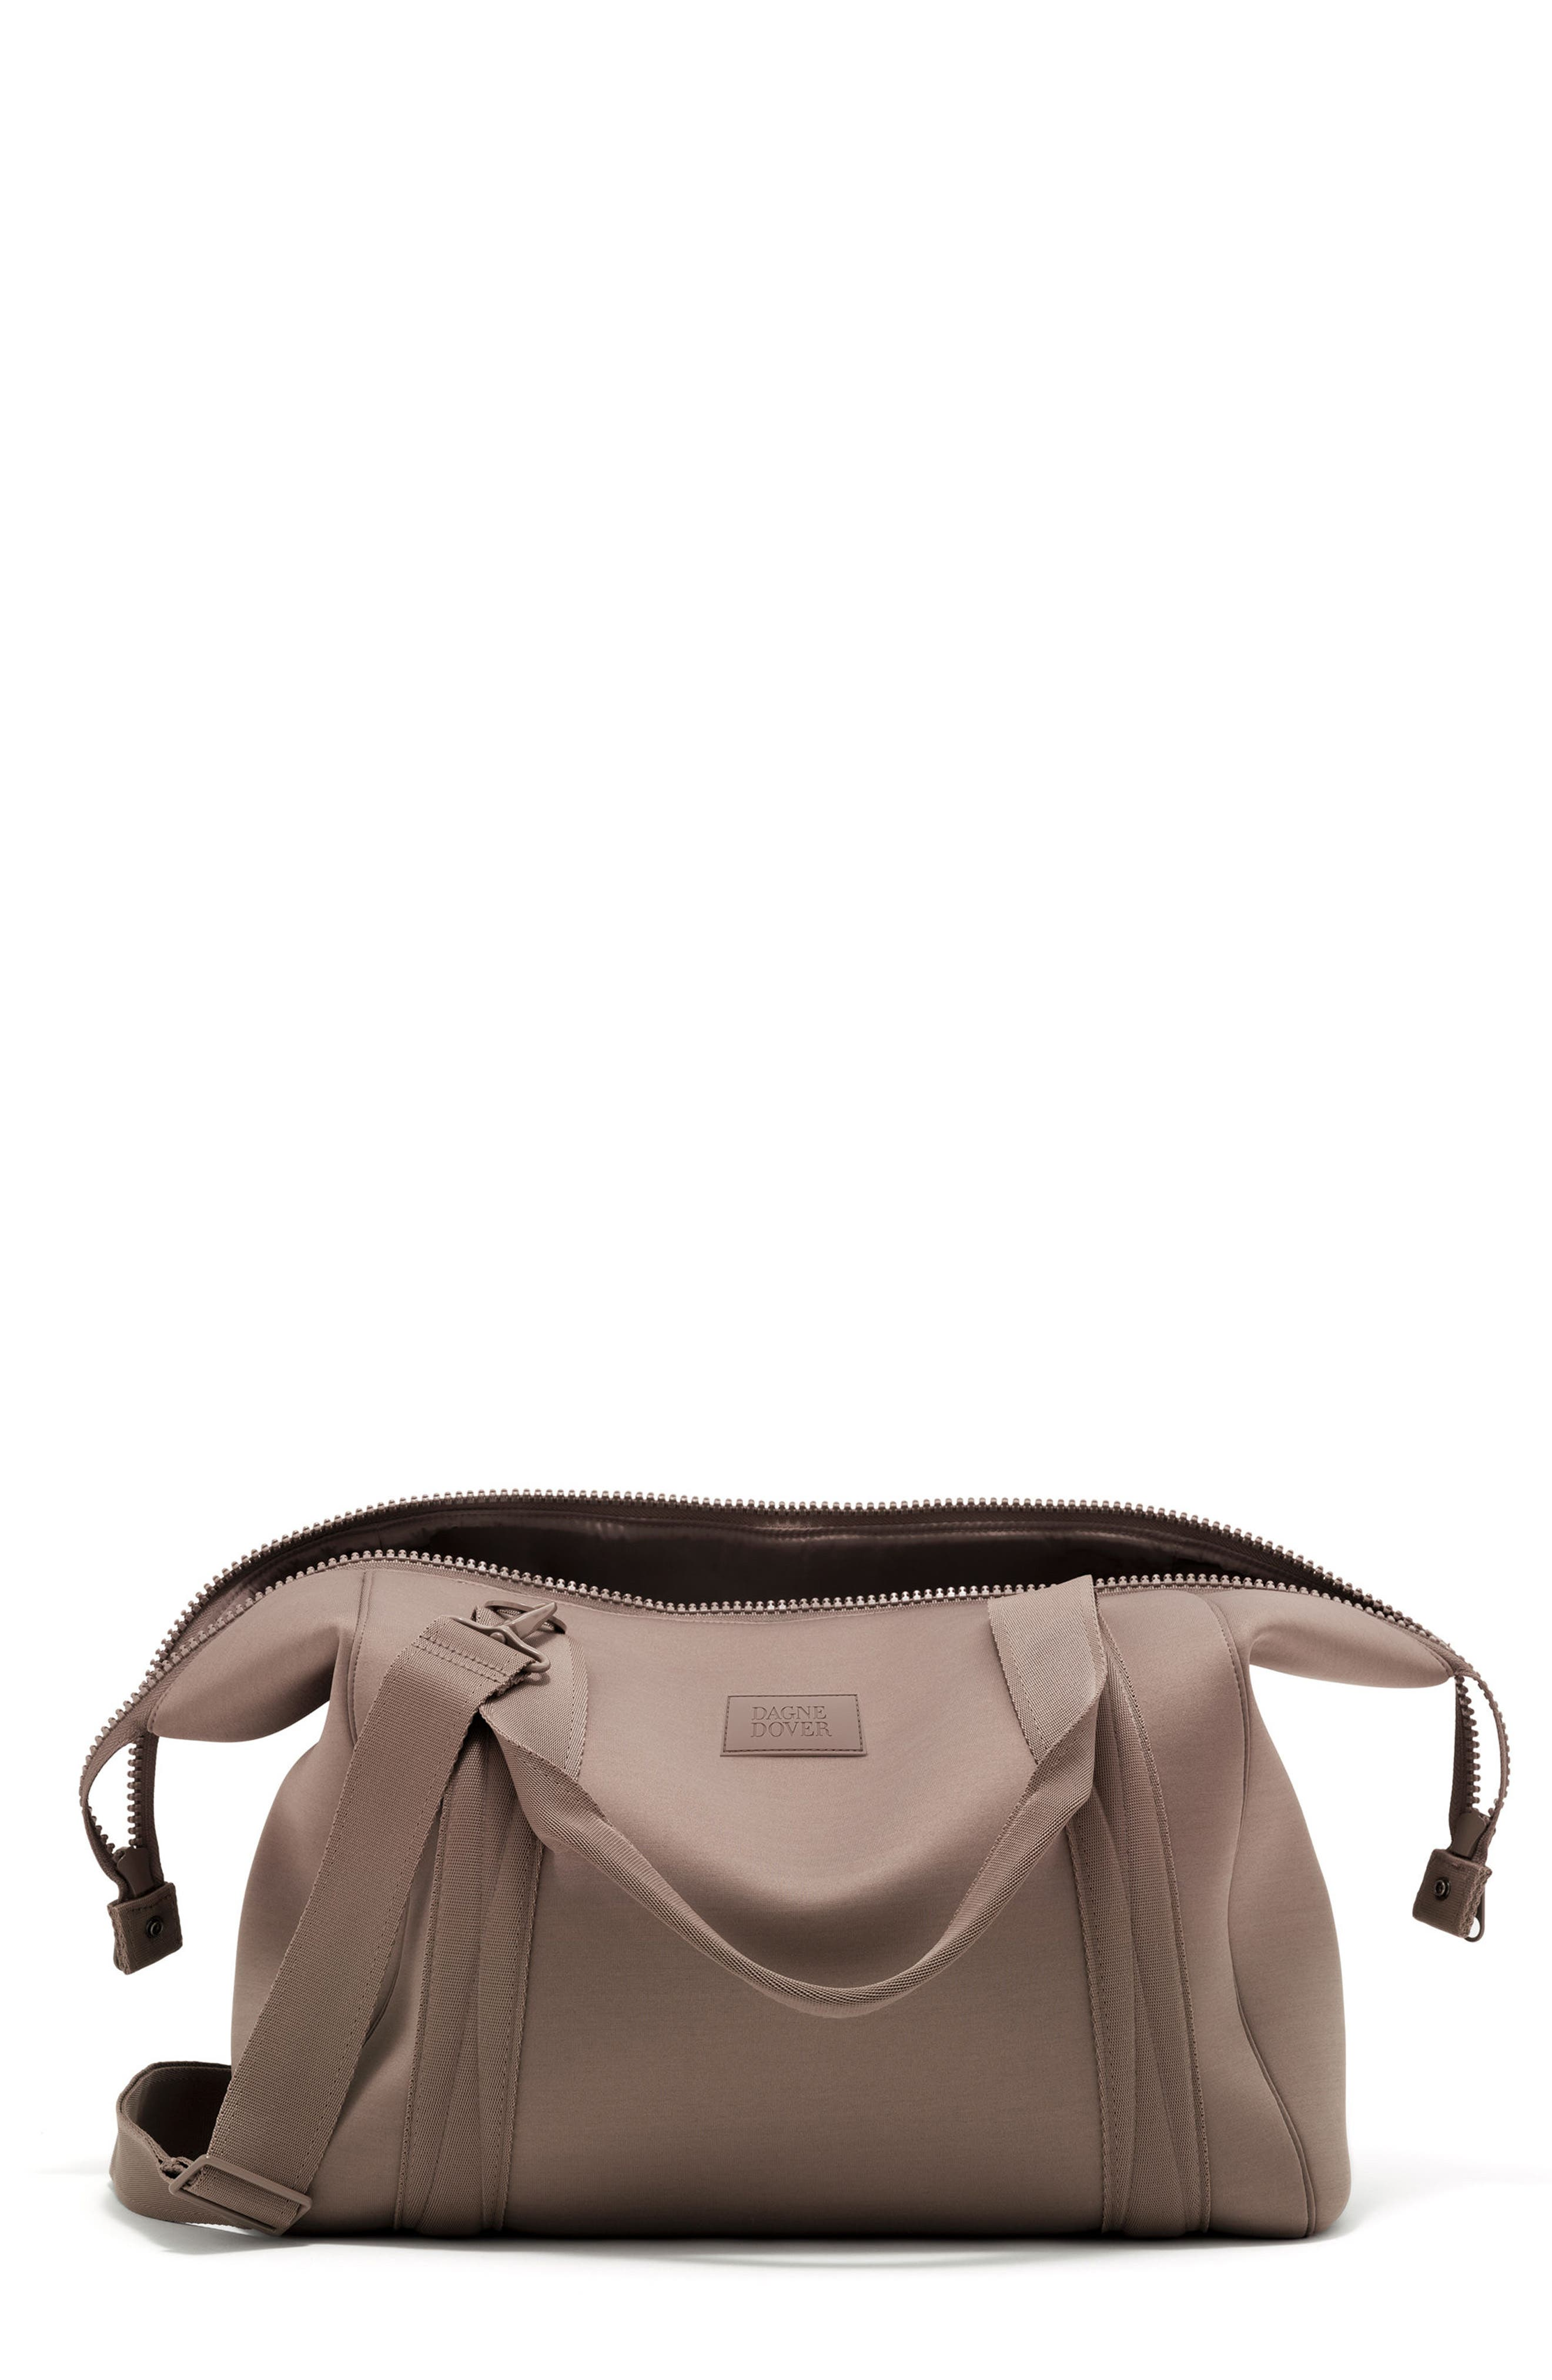 365 Large Landon Neoprene Carryall Duffel Bag,                             Main thumbnail 3, color,